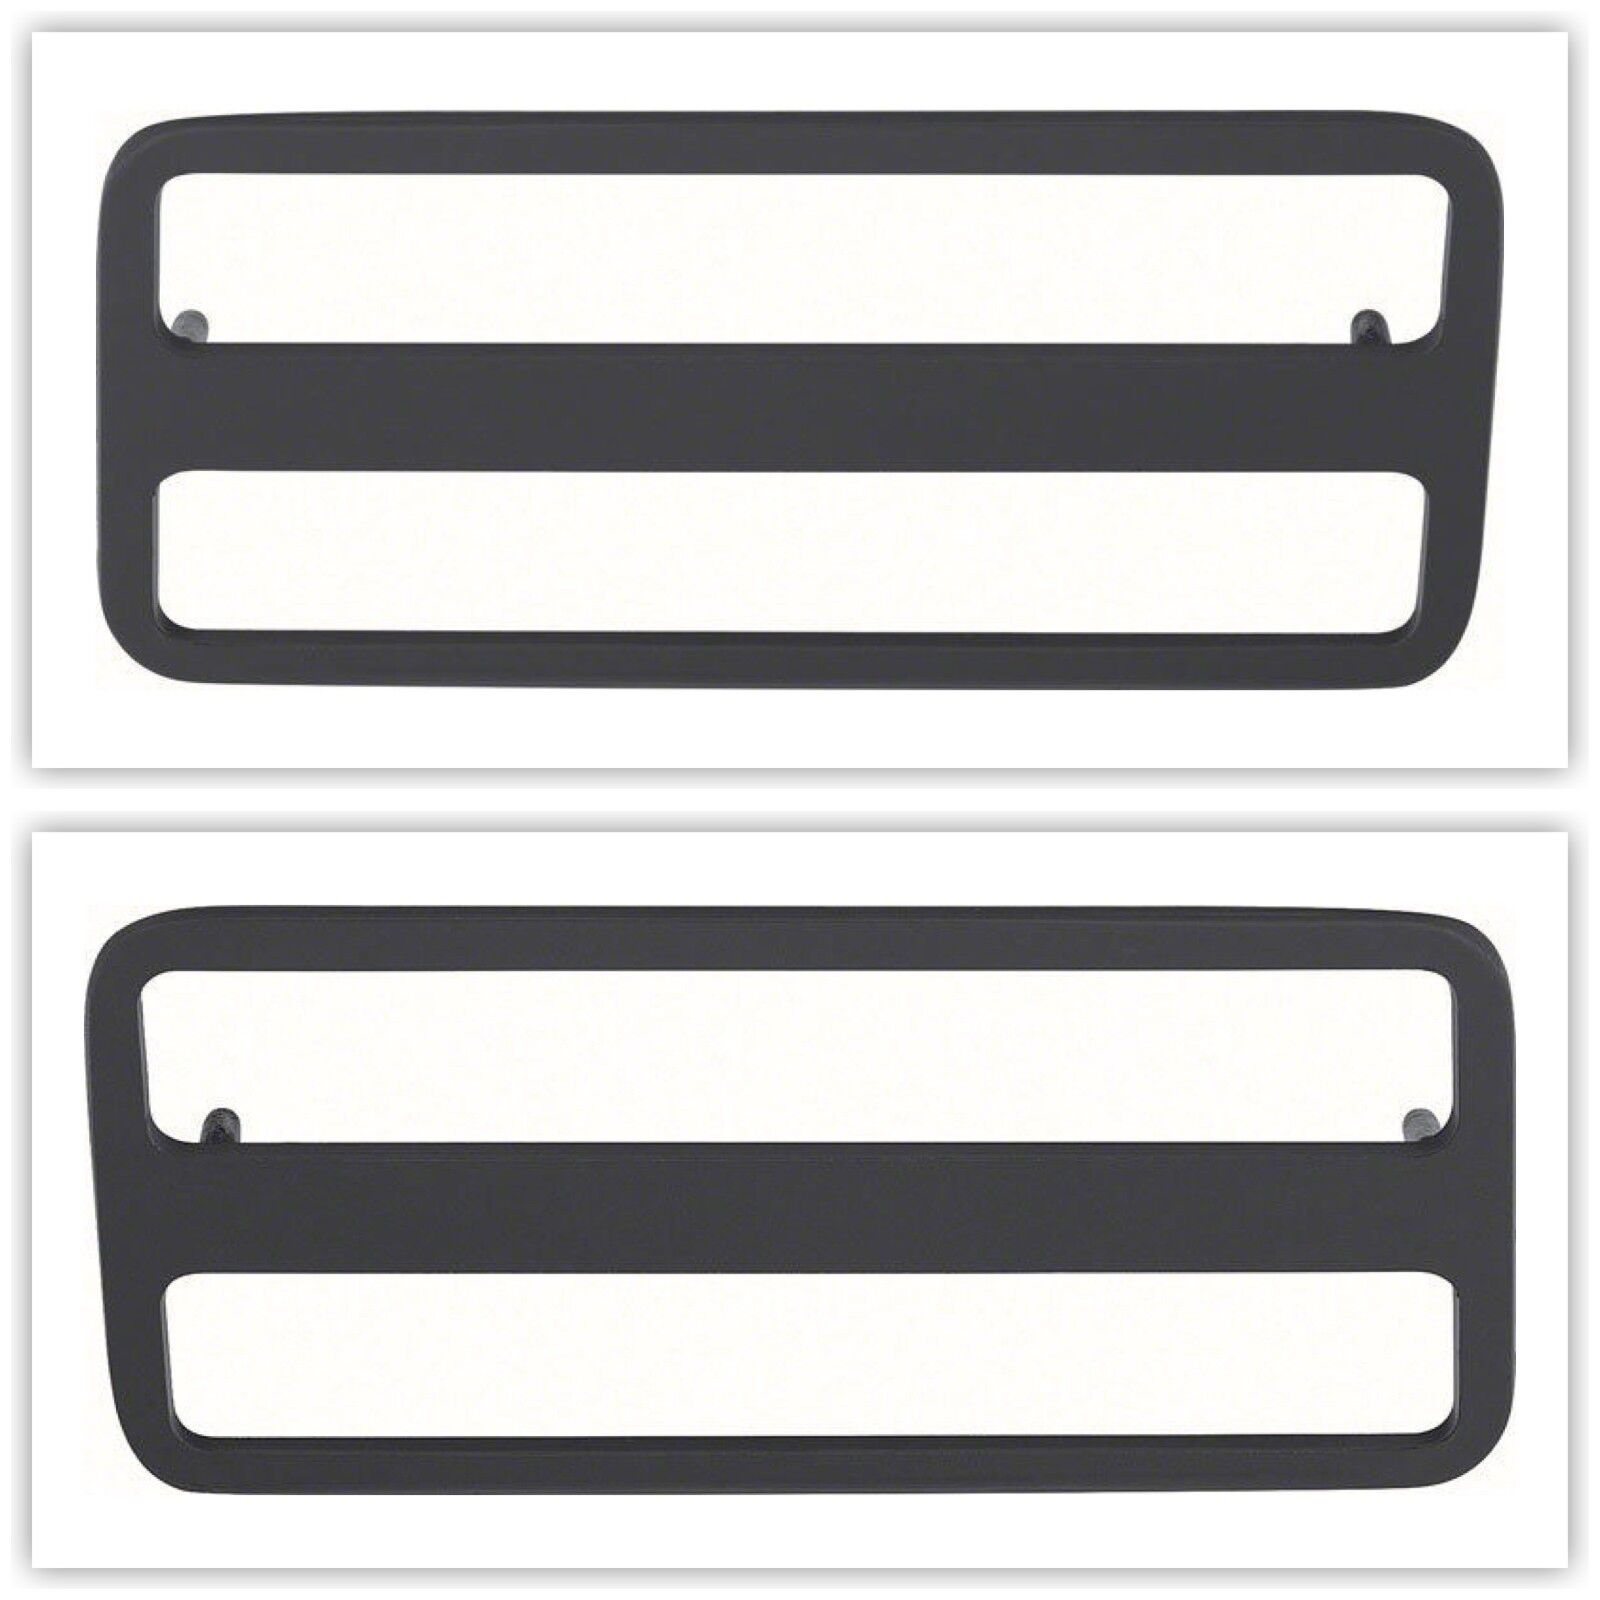 OER 479630/31 1970-81 Rear Side Marker Bezel Pontiac Firebird Set/Pair